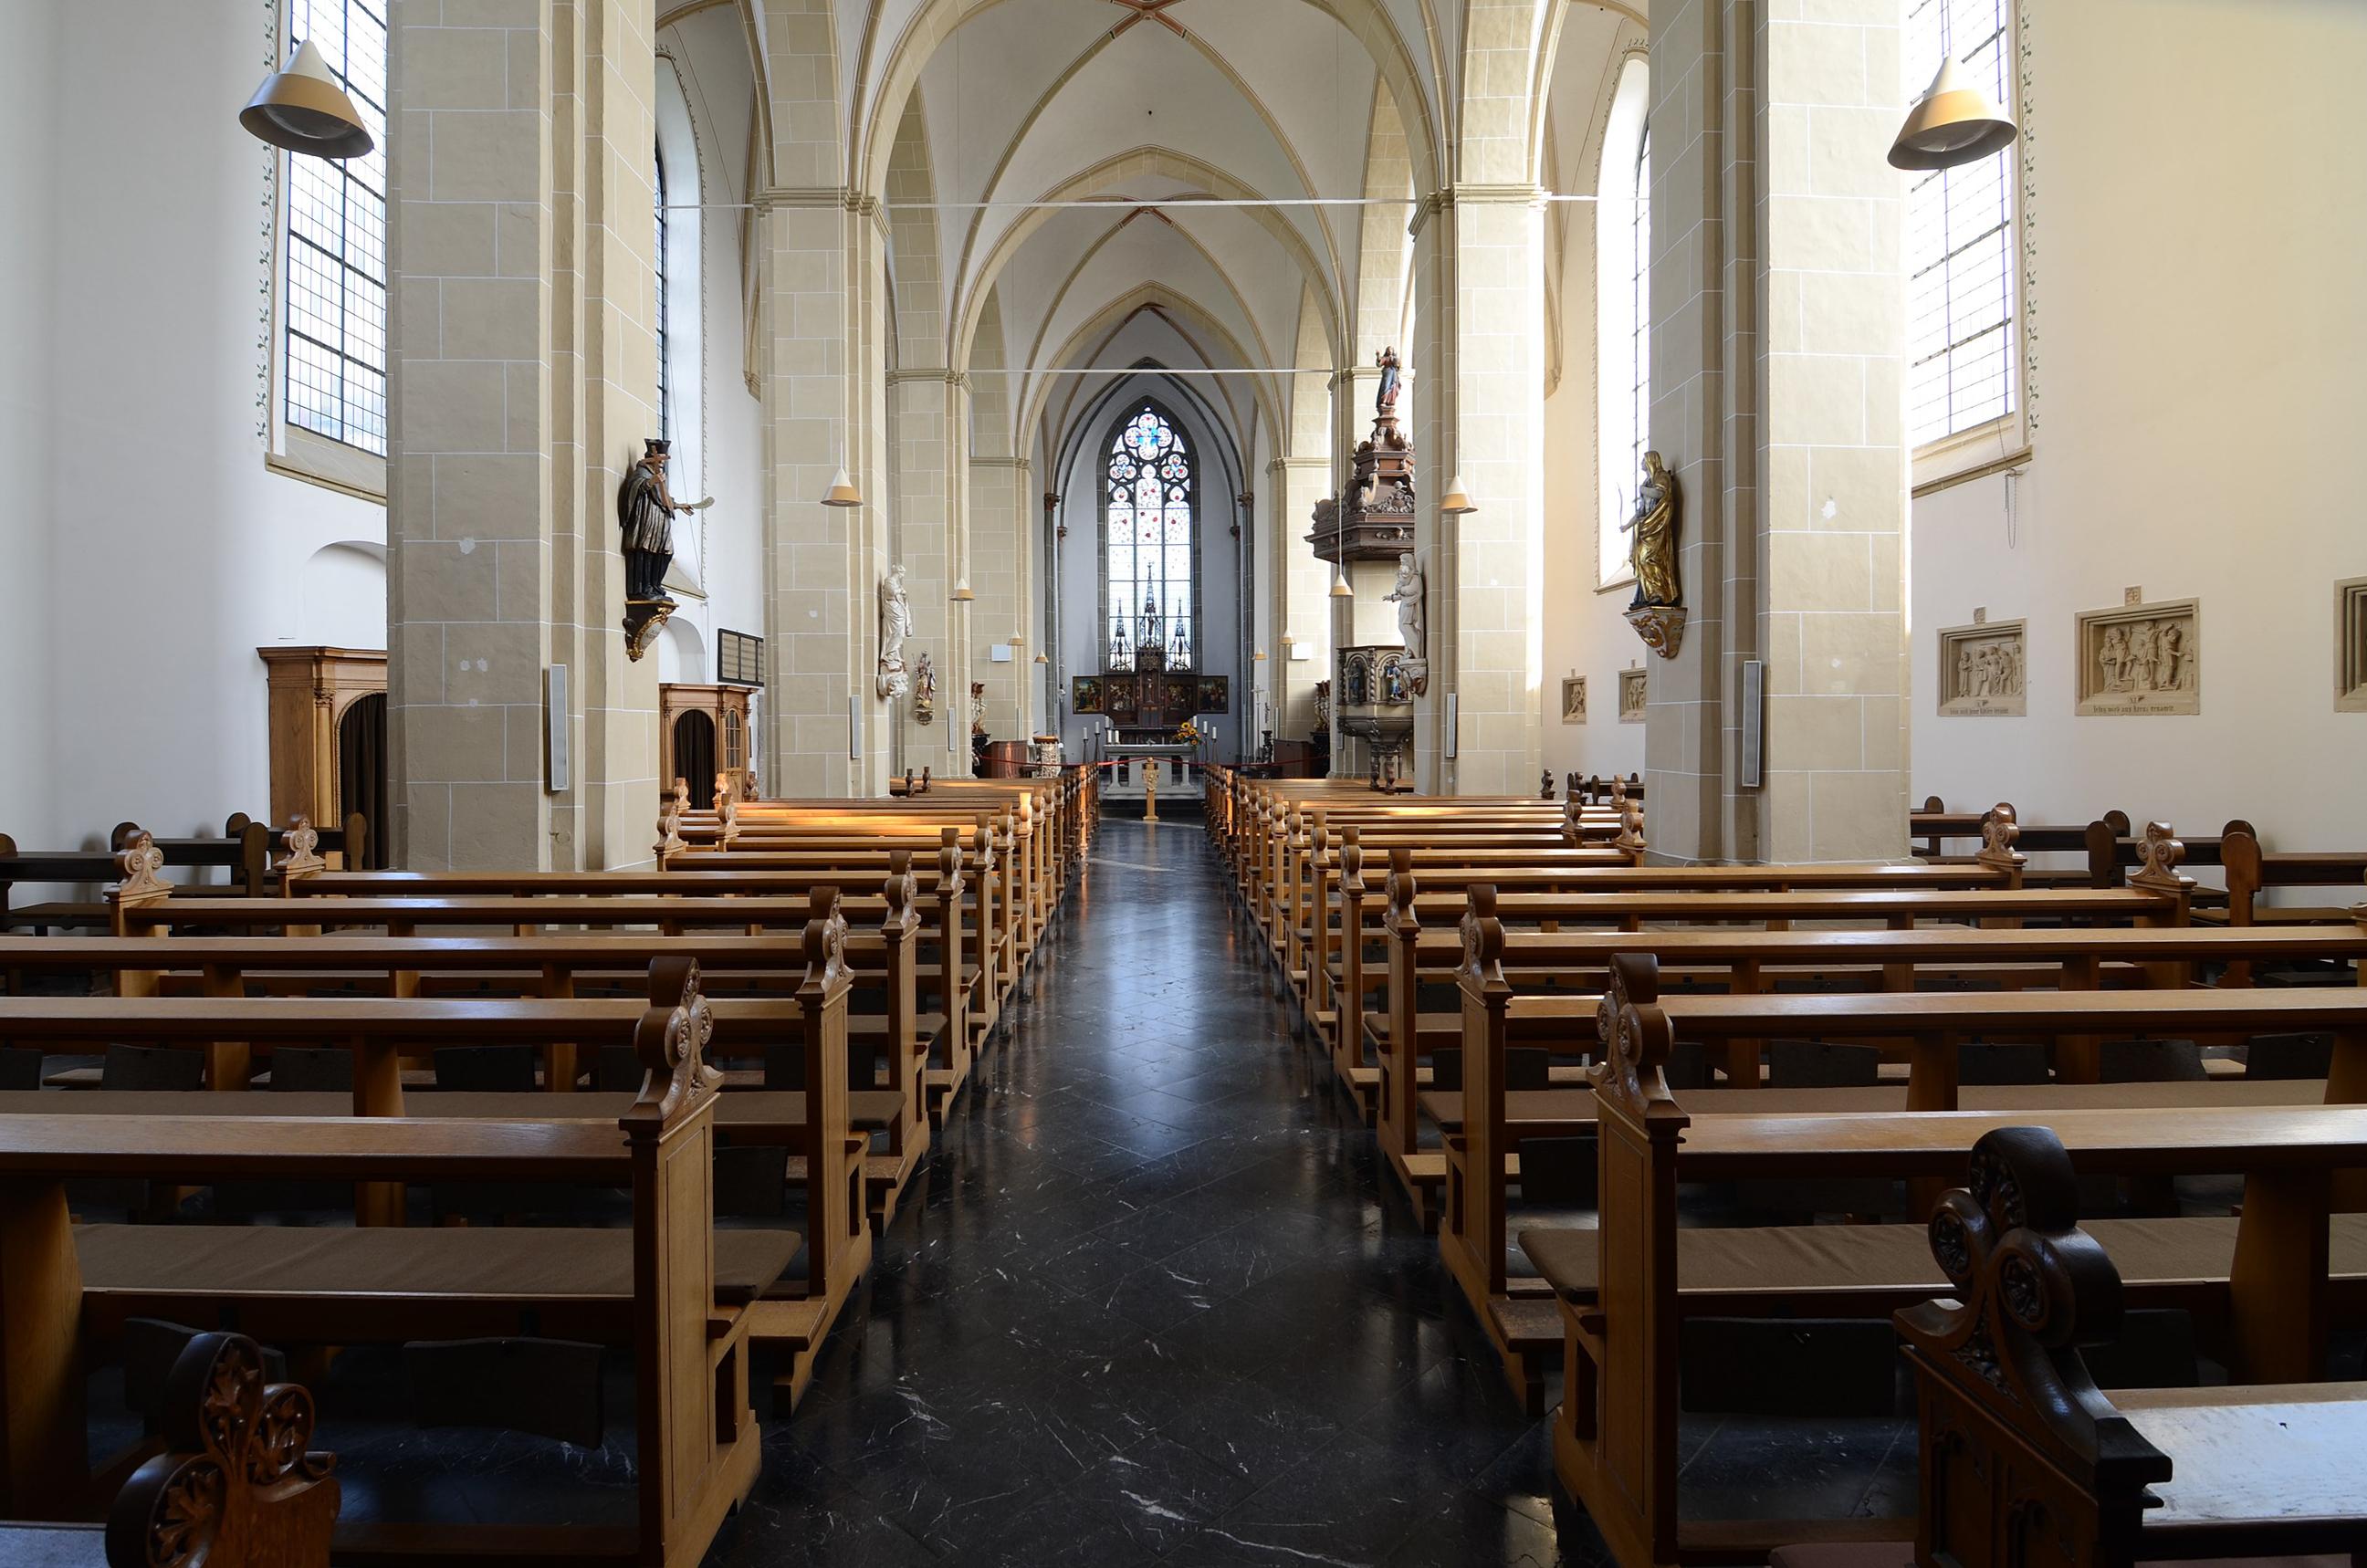 https://upload.wikimedia.org/wikipedia/commons/c/c8/Kamp-Lintfort%2C_Kloster_Kamp%2C_Abteikirche%2C_2014-09_CN-01.jpg